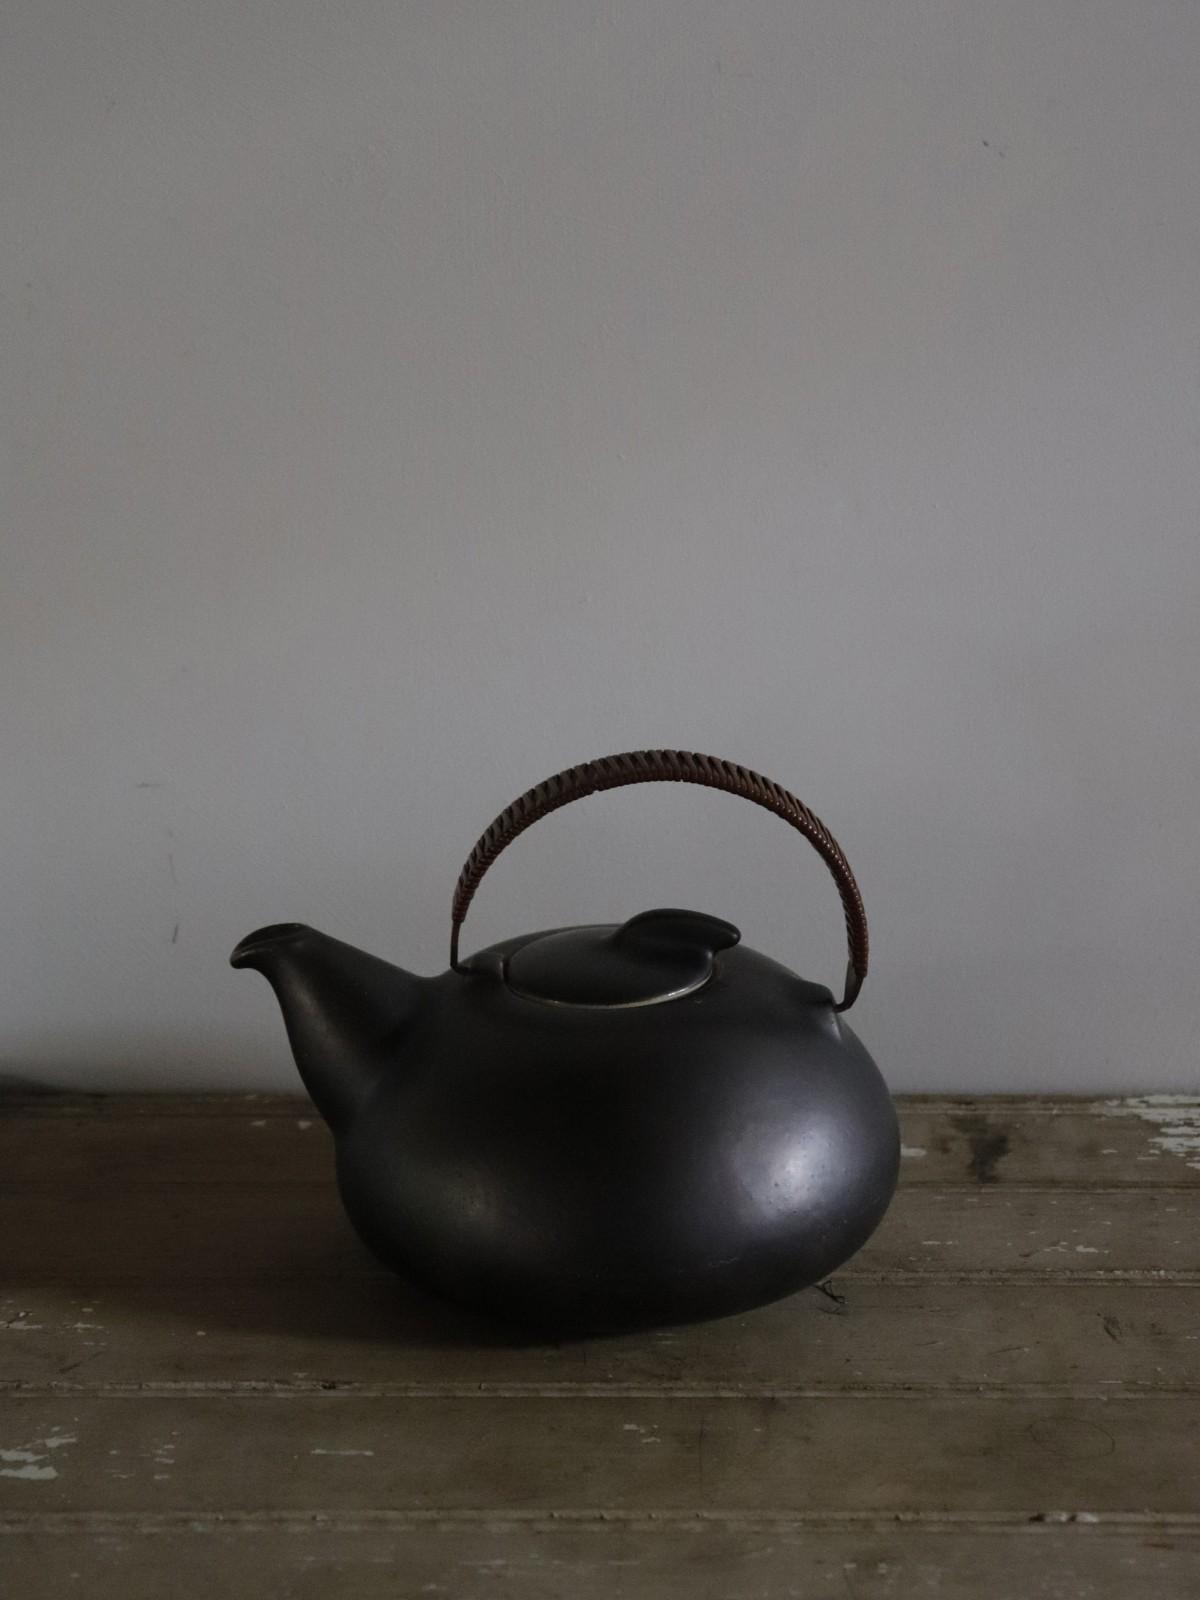 heath ceramics, mcm, usa